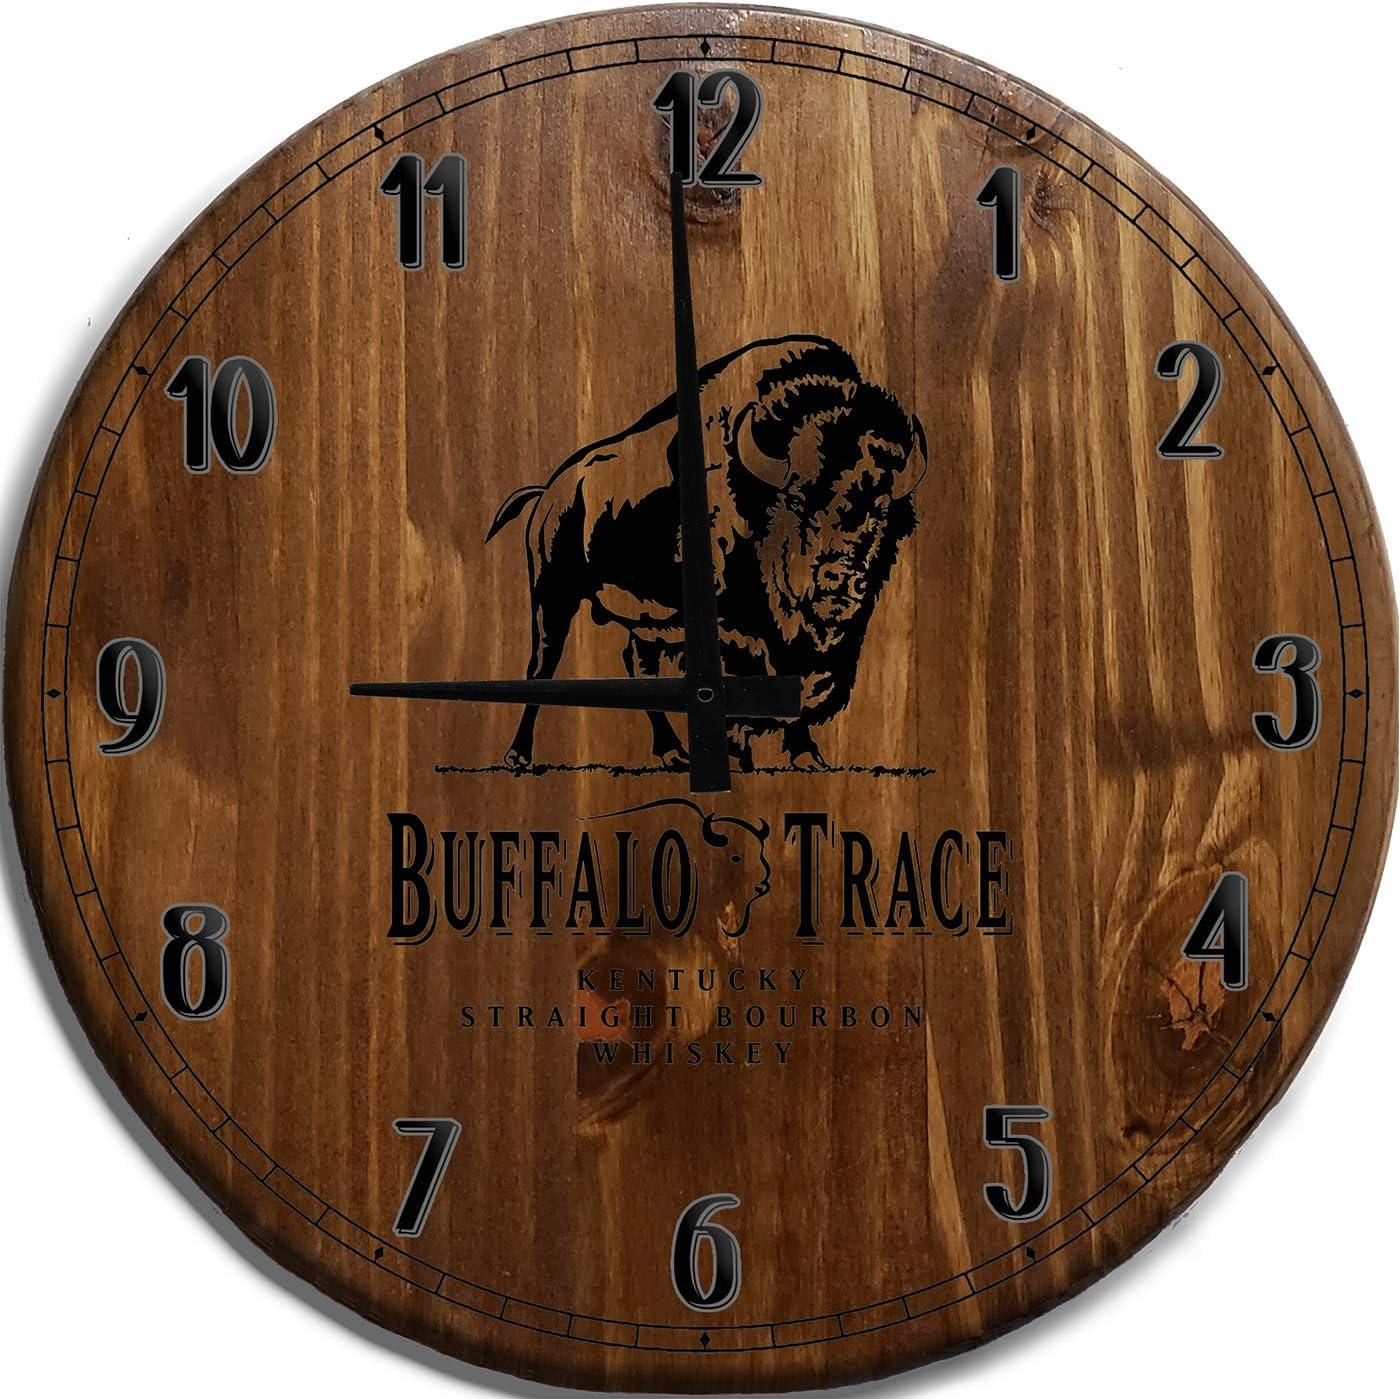 Mnk Large Wall Clock 24 Inch Buffalo Trace Kentucky Bourbon Whiskey Bar Sign Home D cor Brown Wall Decor